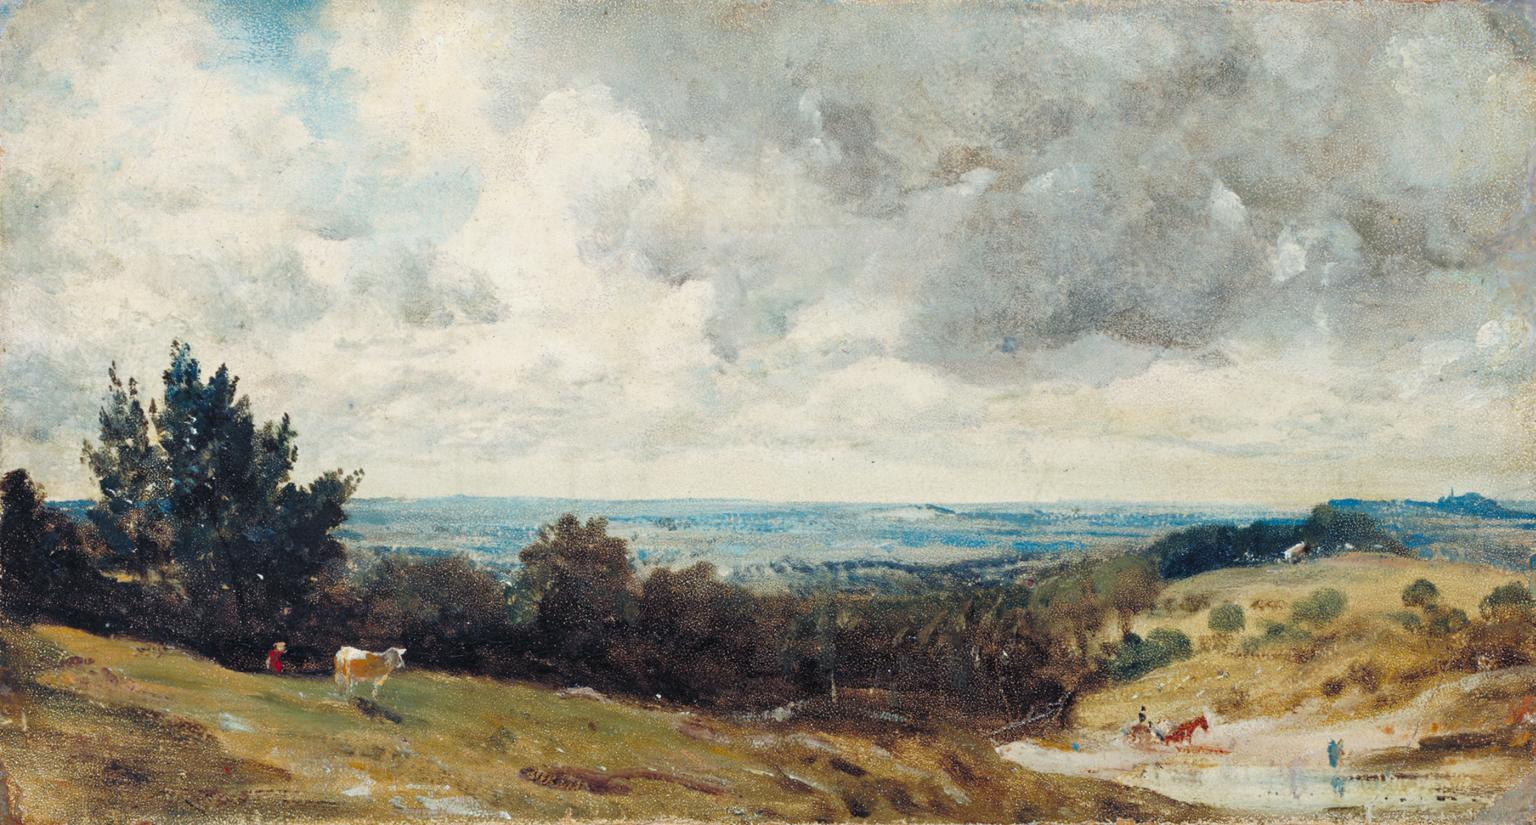 Hampstead Heath John Constable 1820